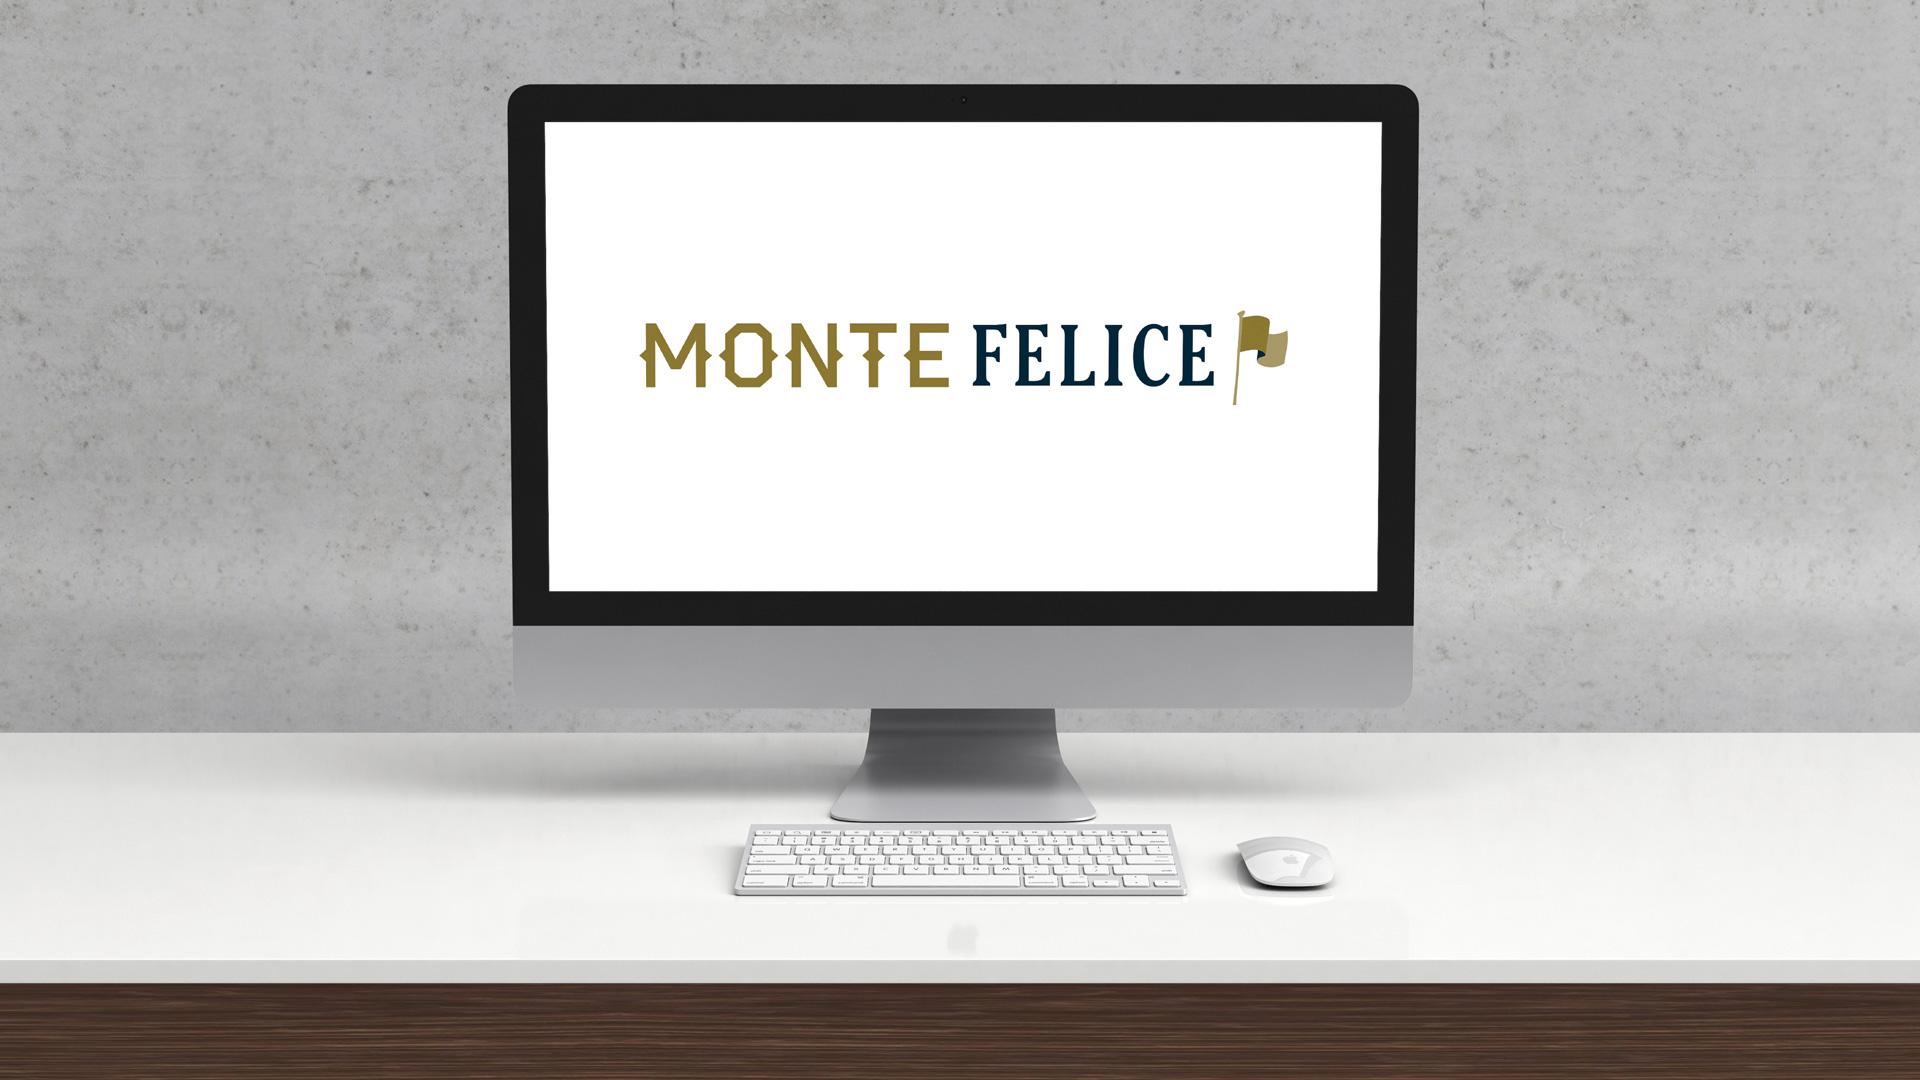 DALE-MONTE_FELICE-Logo_imac